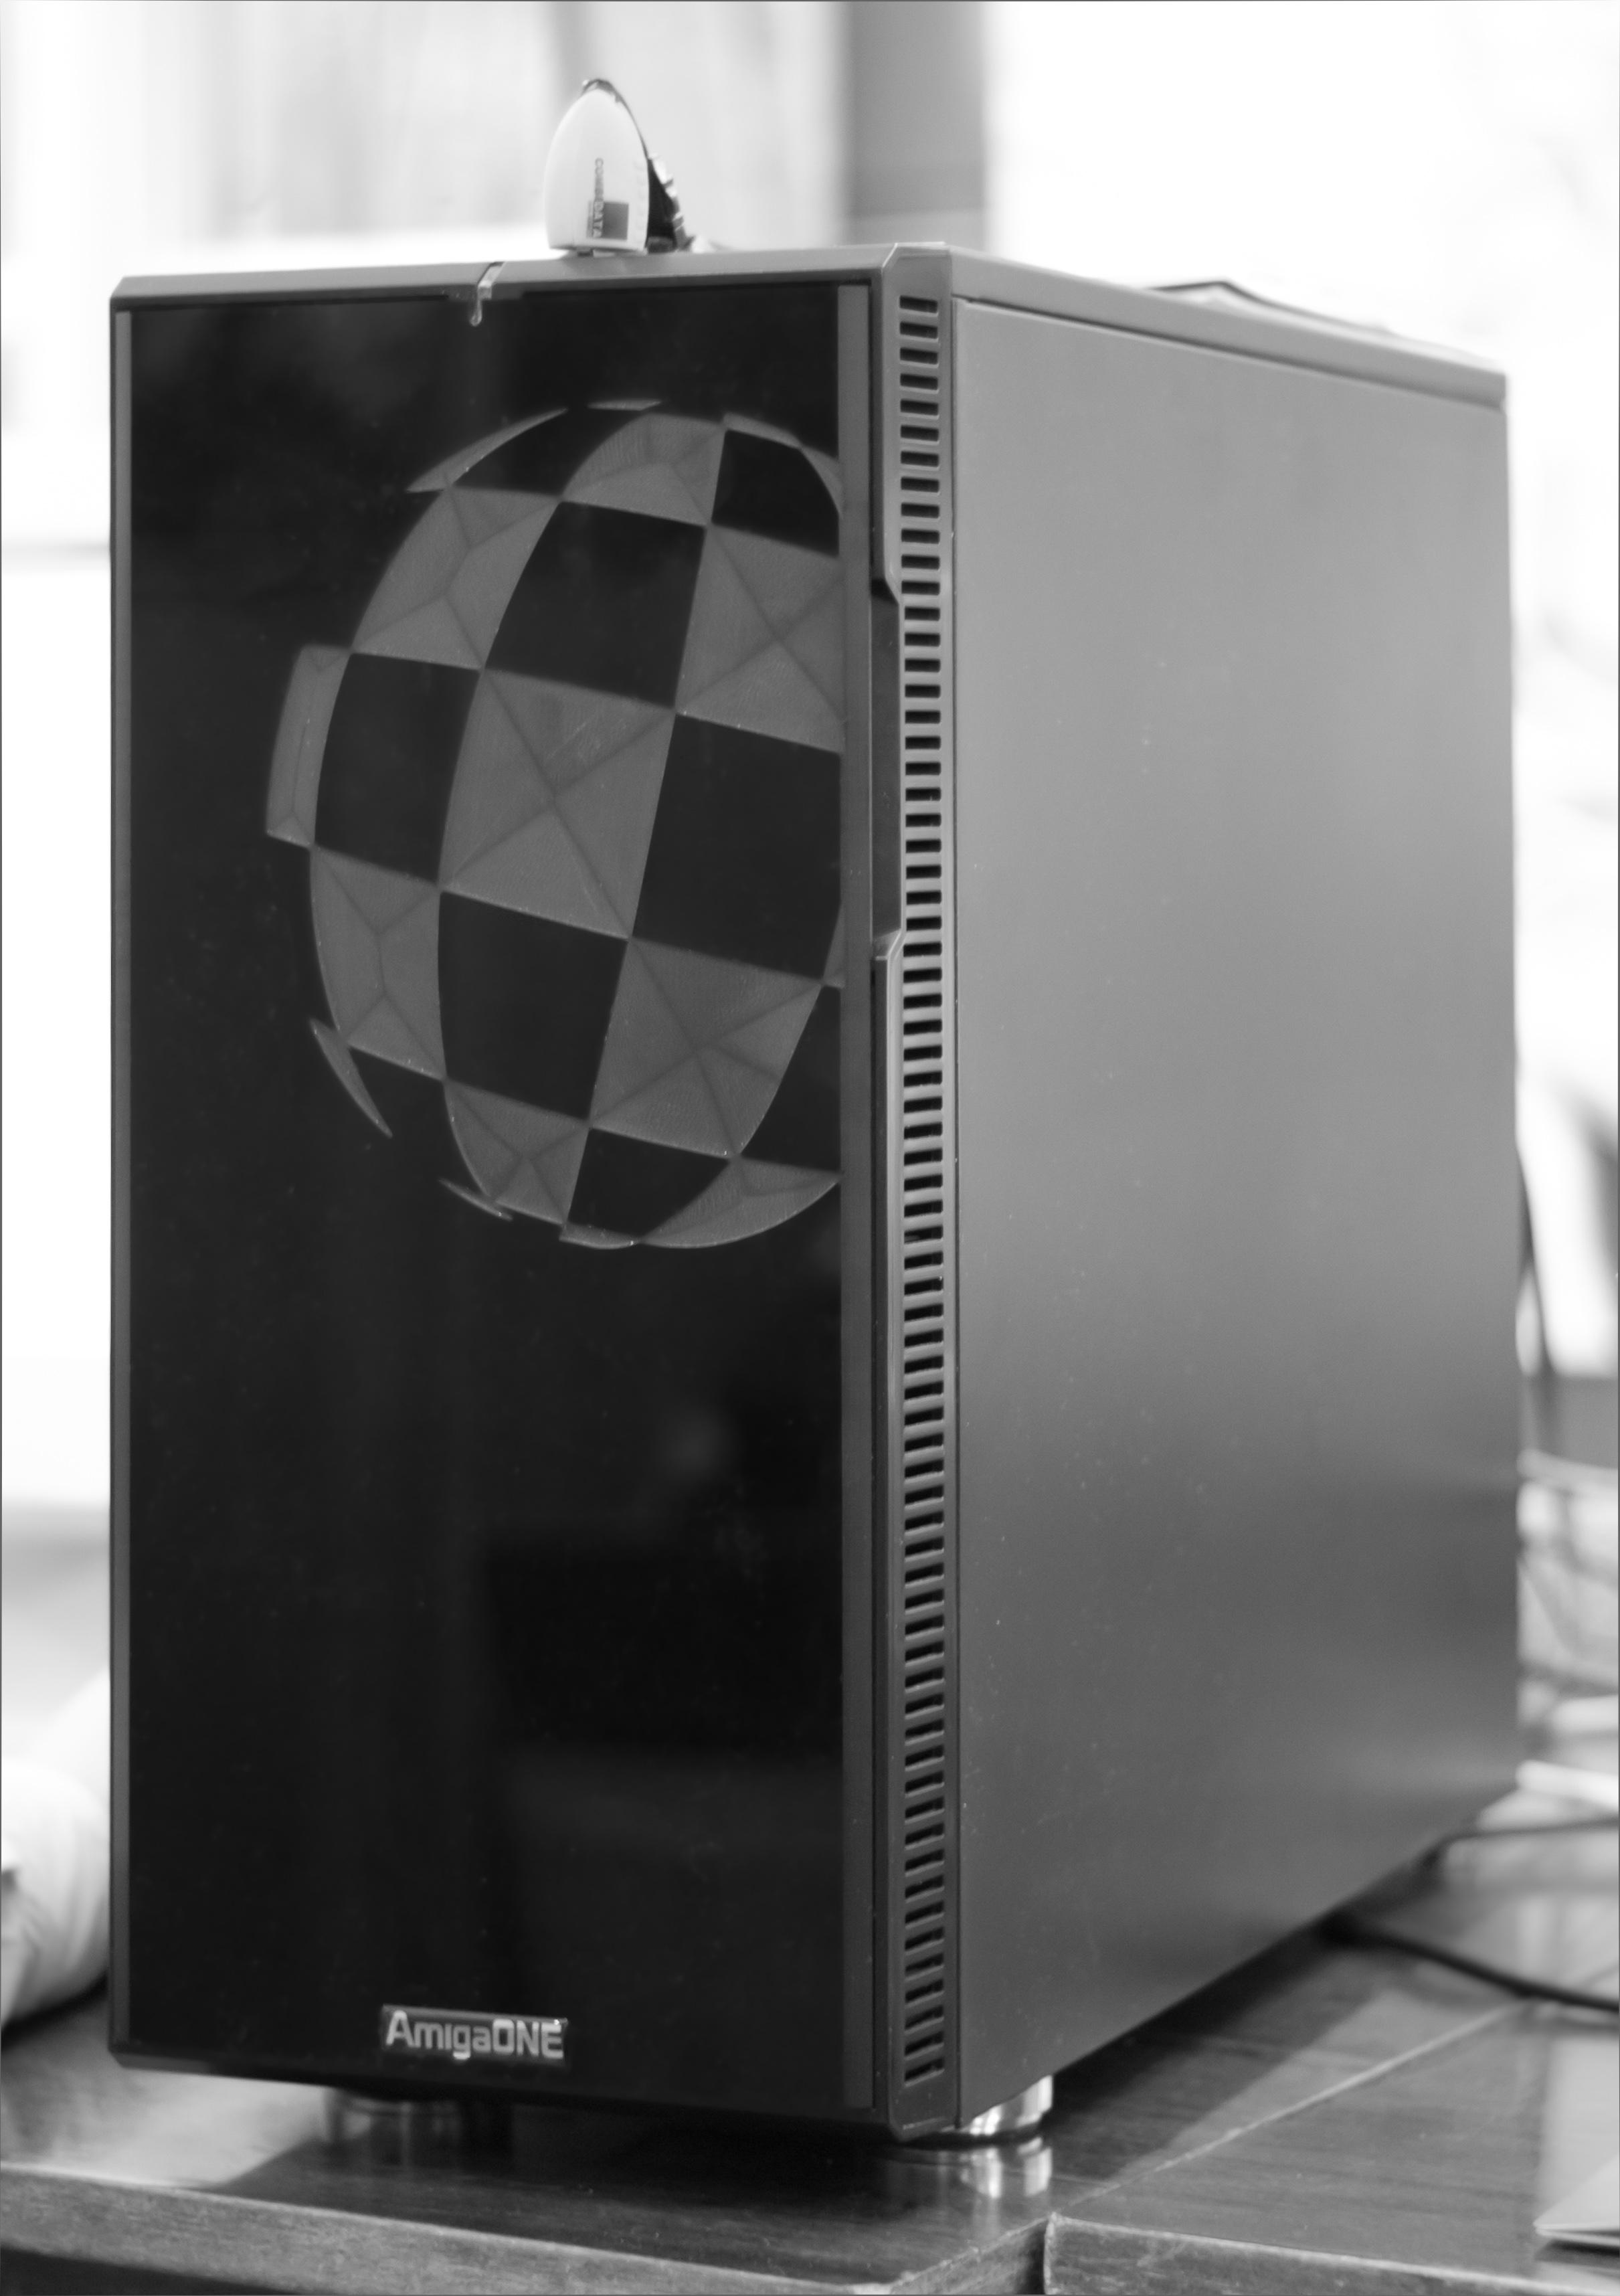 Amiga X1000 (Wikipedia)